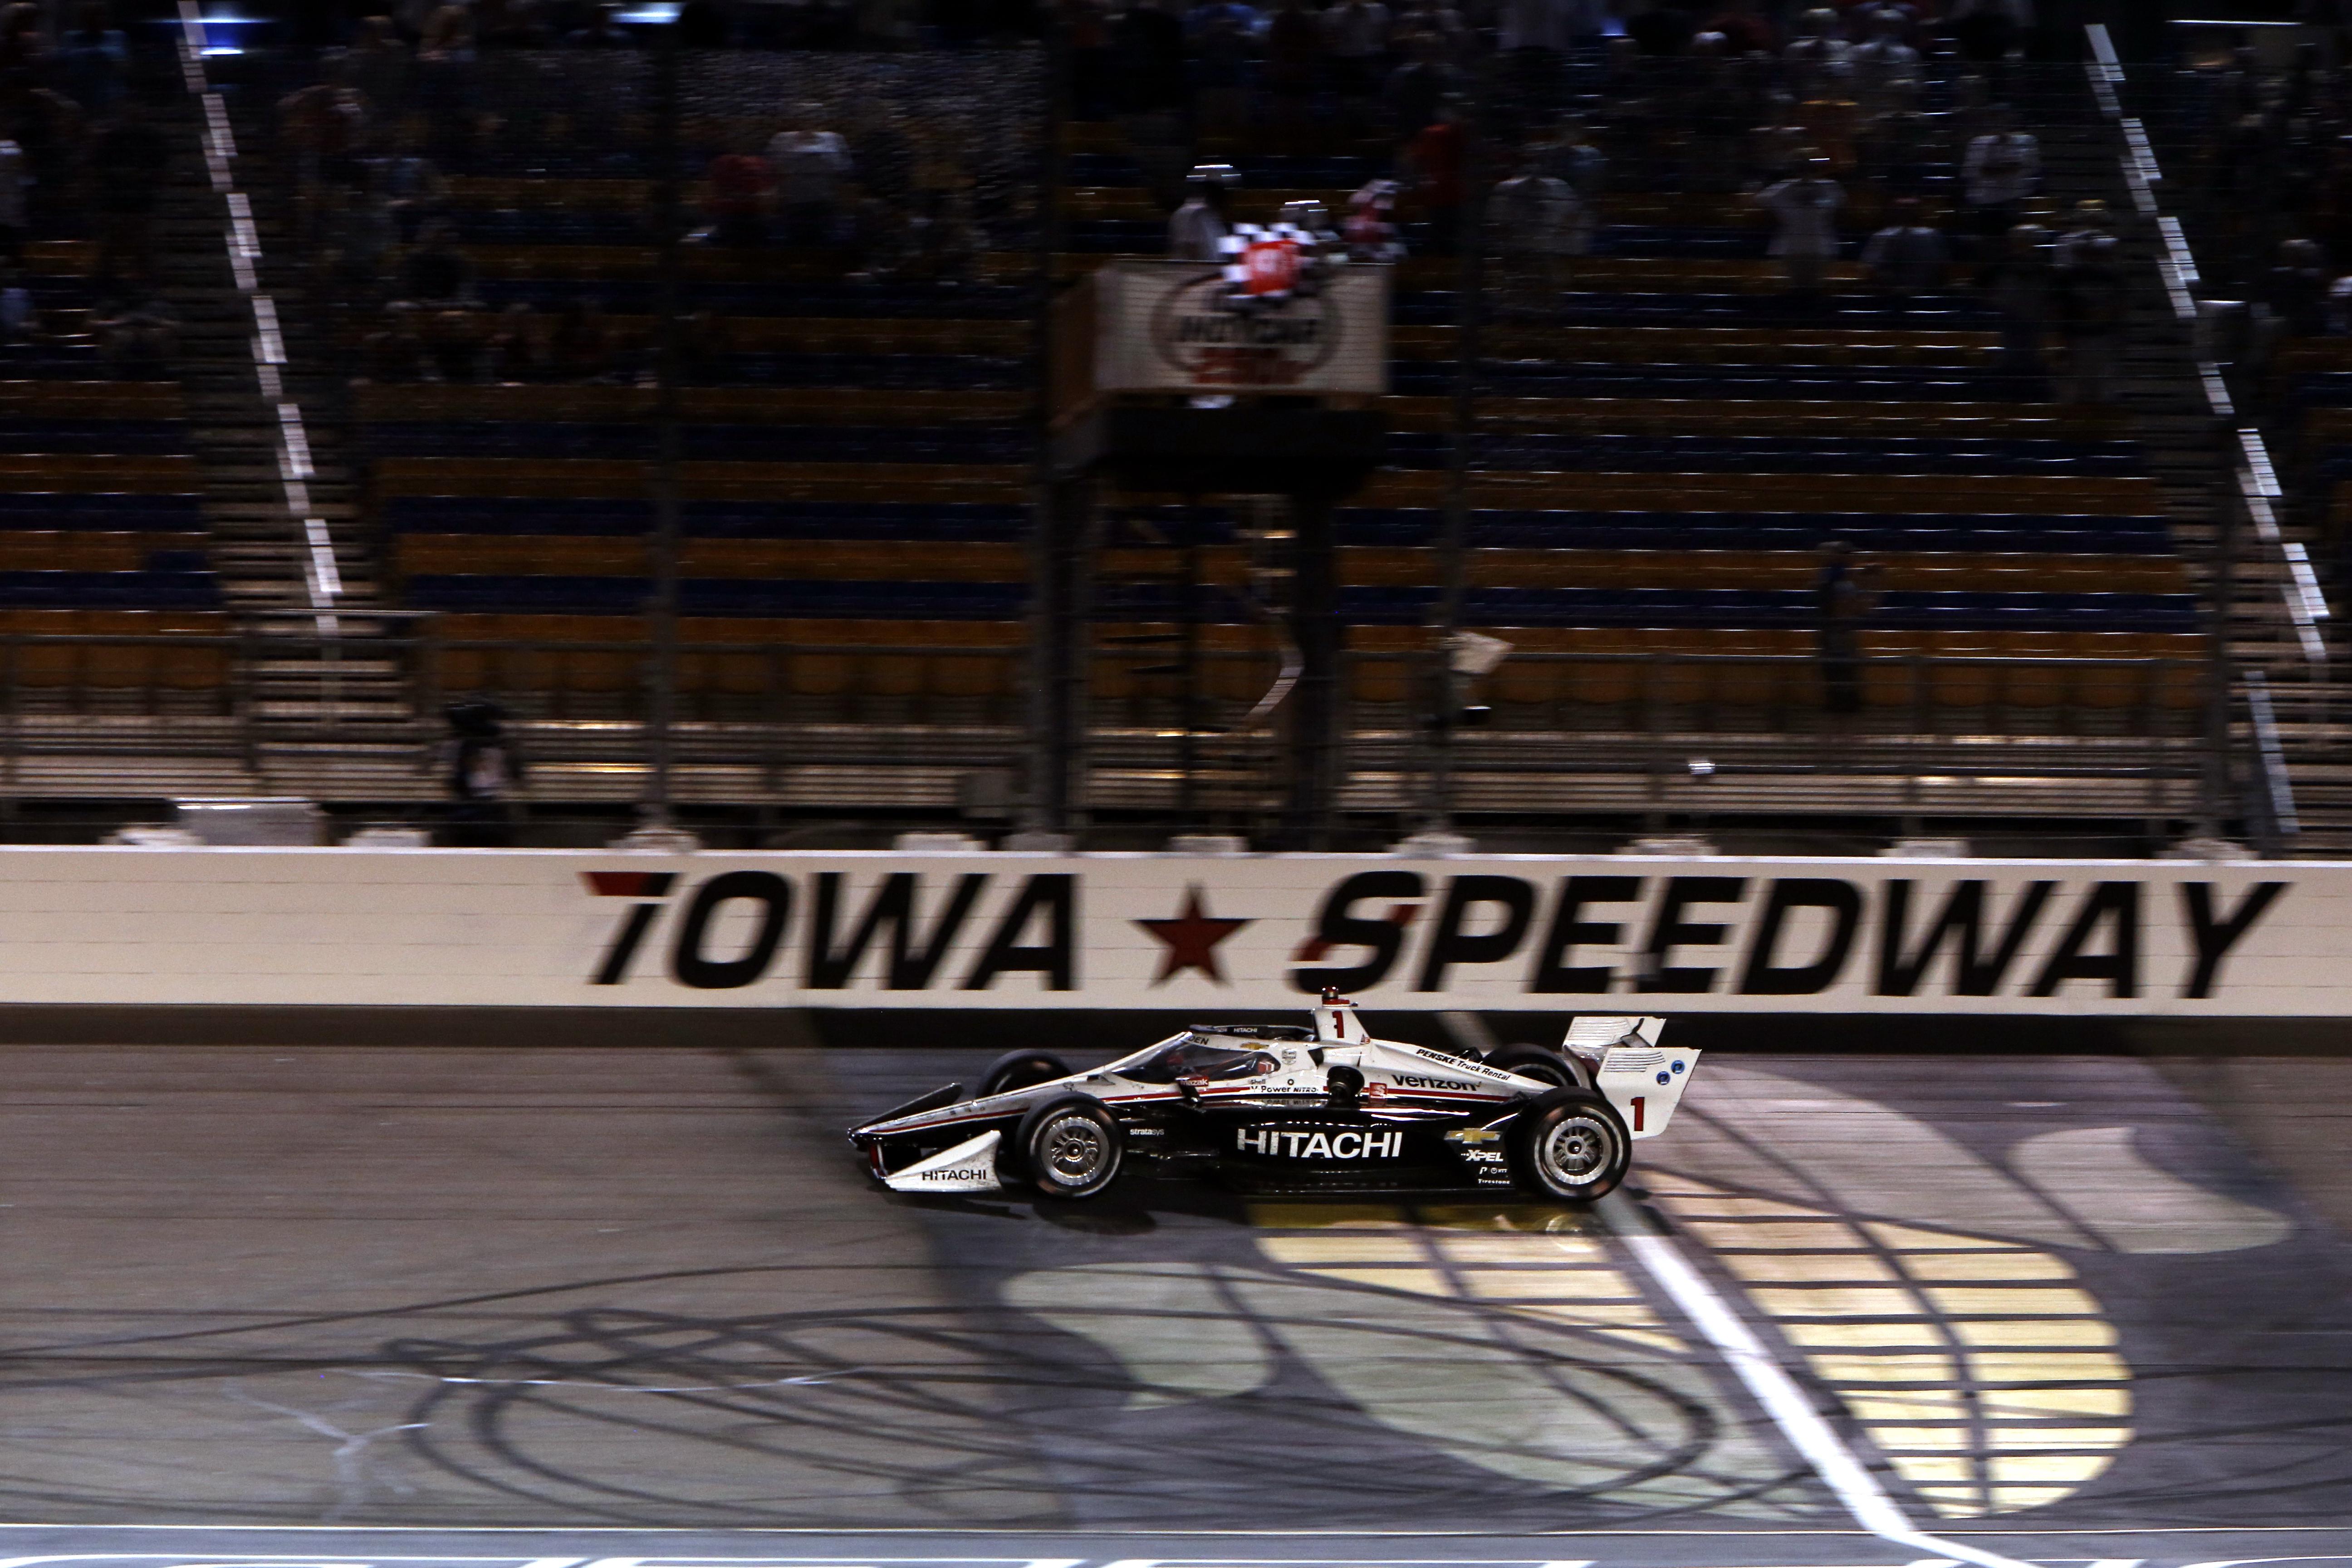 Josef Newgarden Penske wins Iowa IndyCar 2020